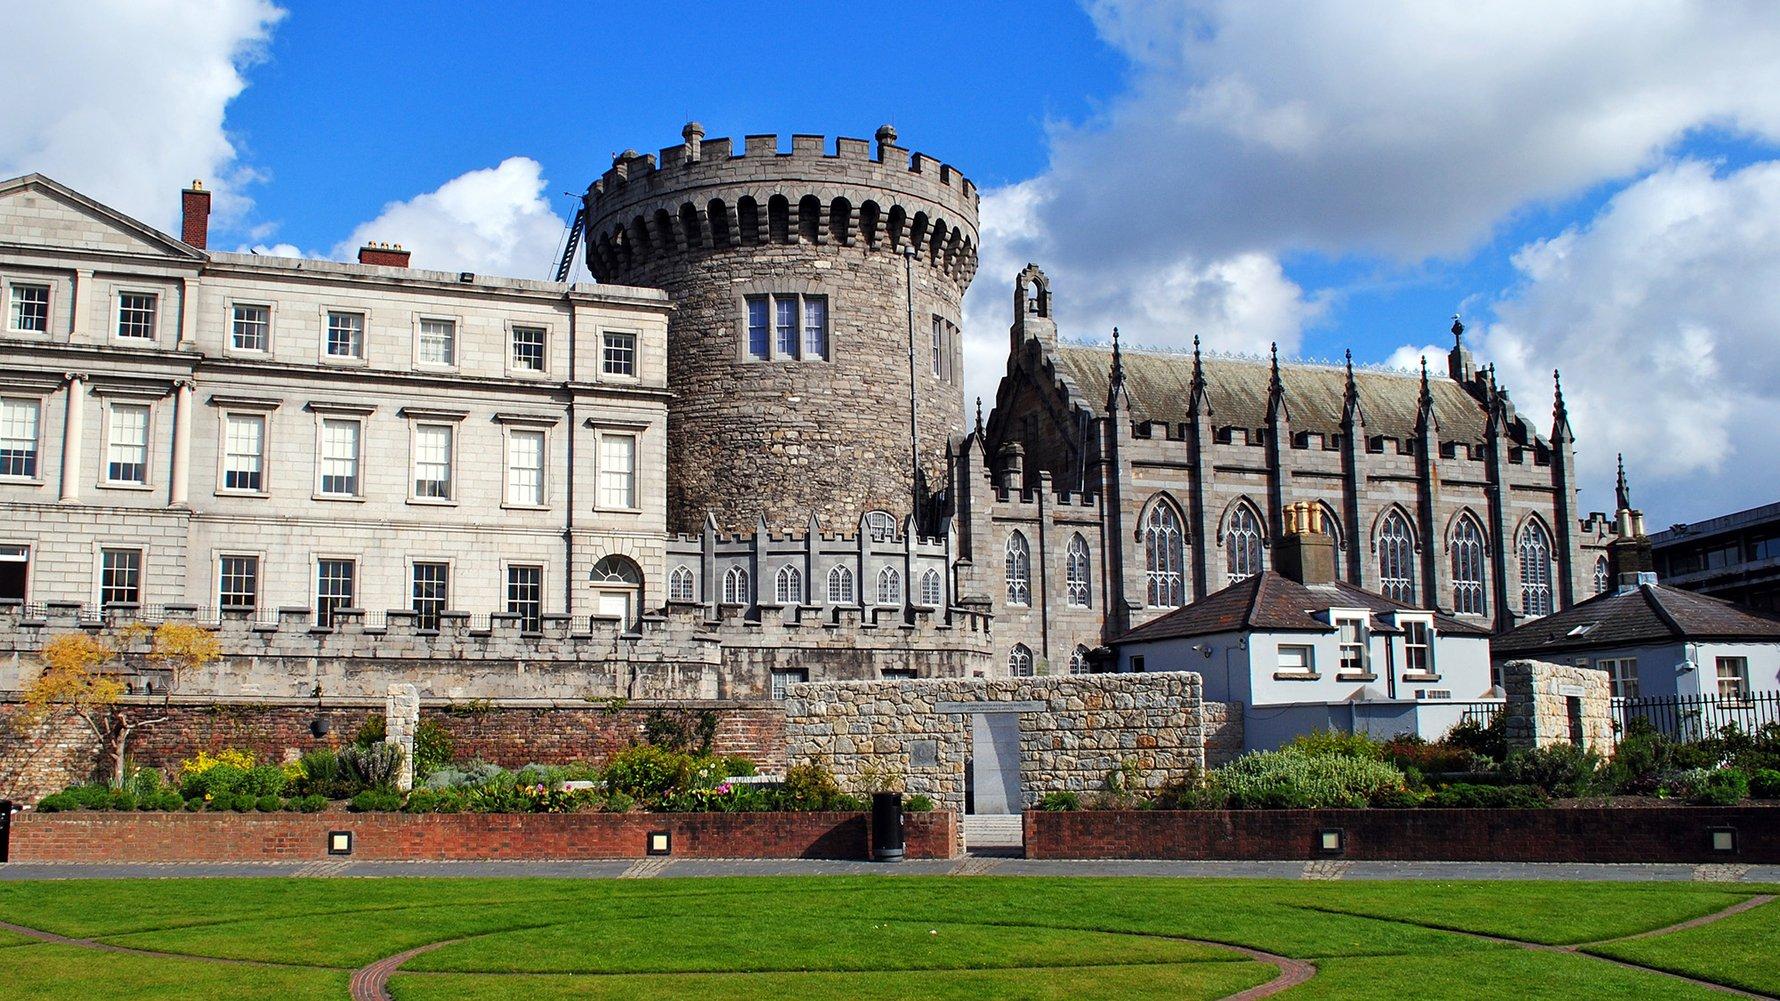 © Matej Hudovernik Shutterstock.com  Dublin Castle in Dublin, Ireland